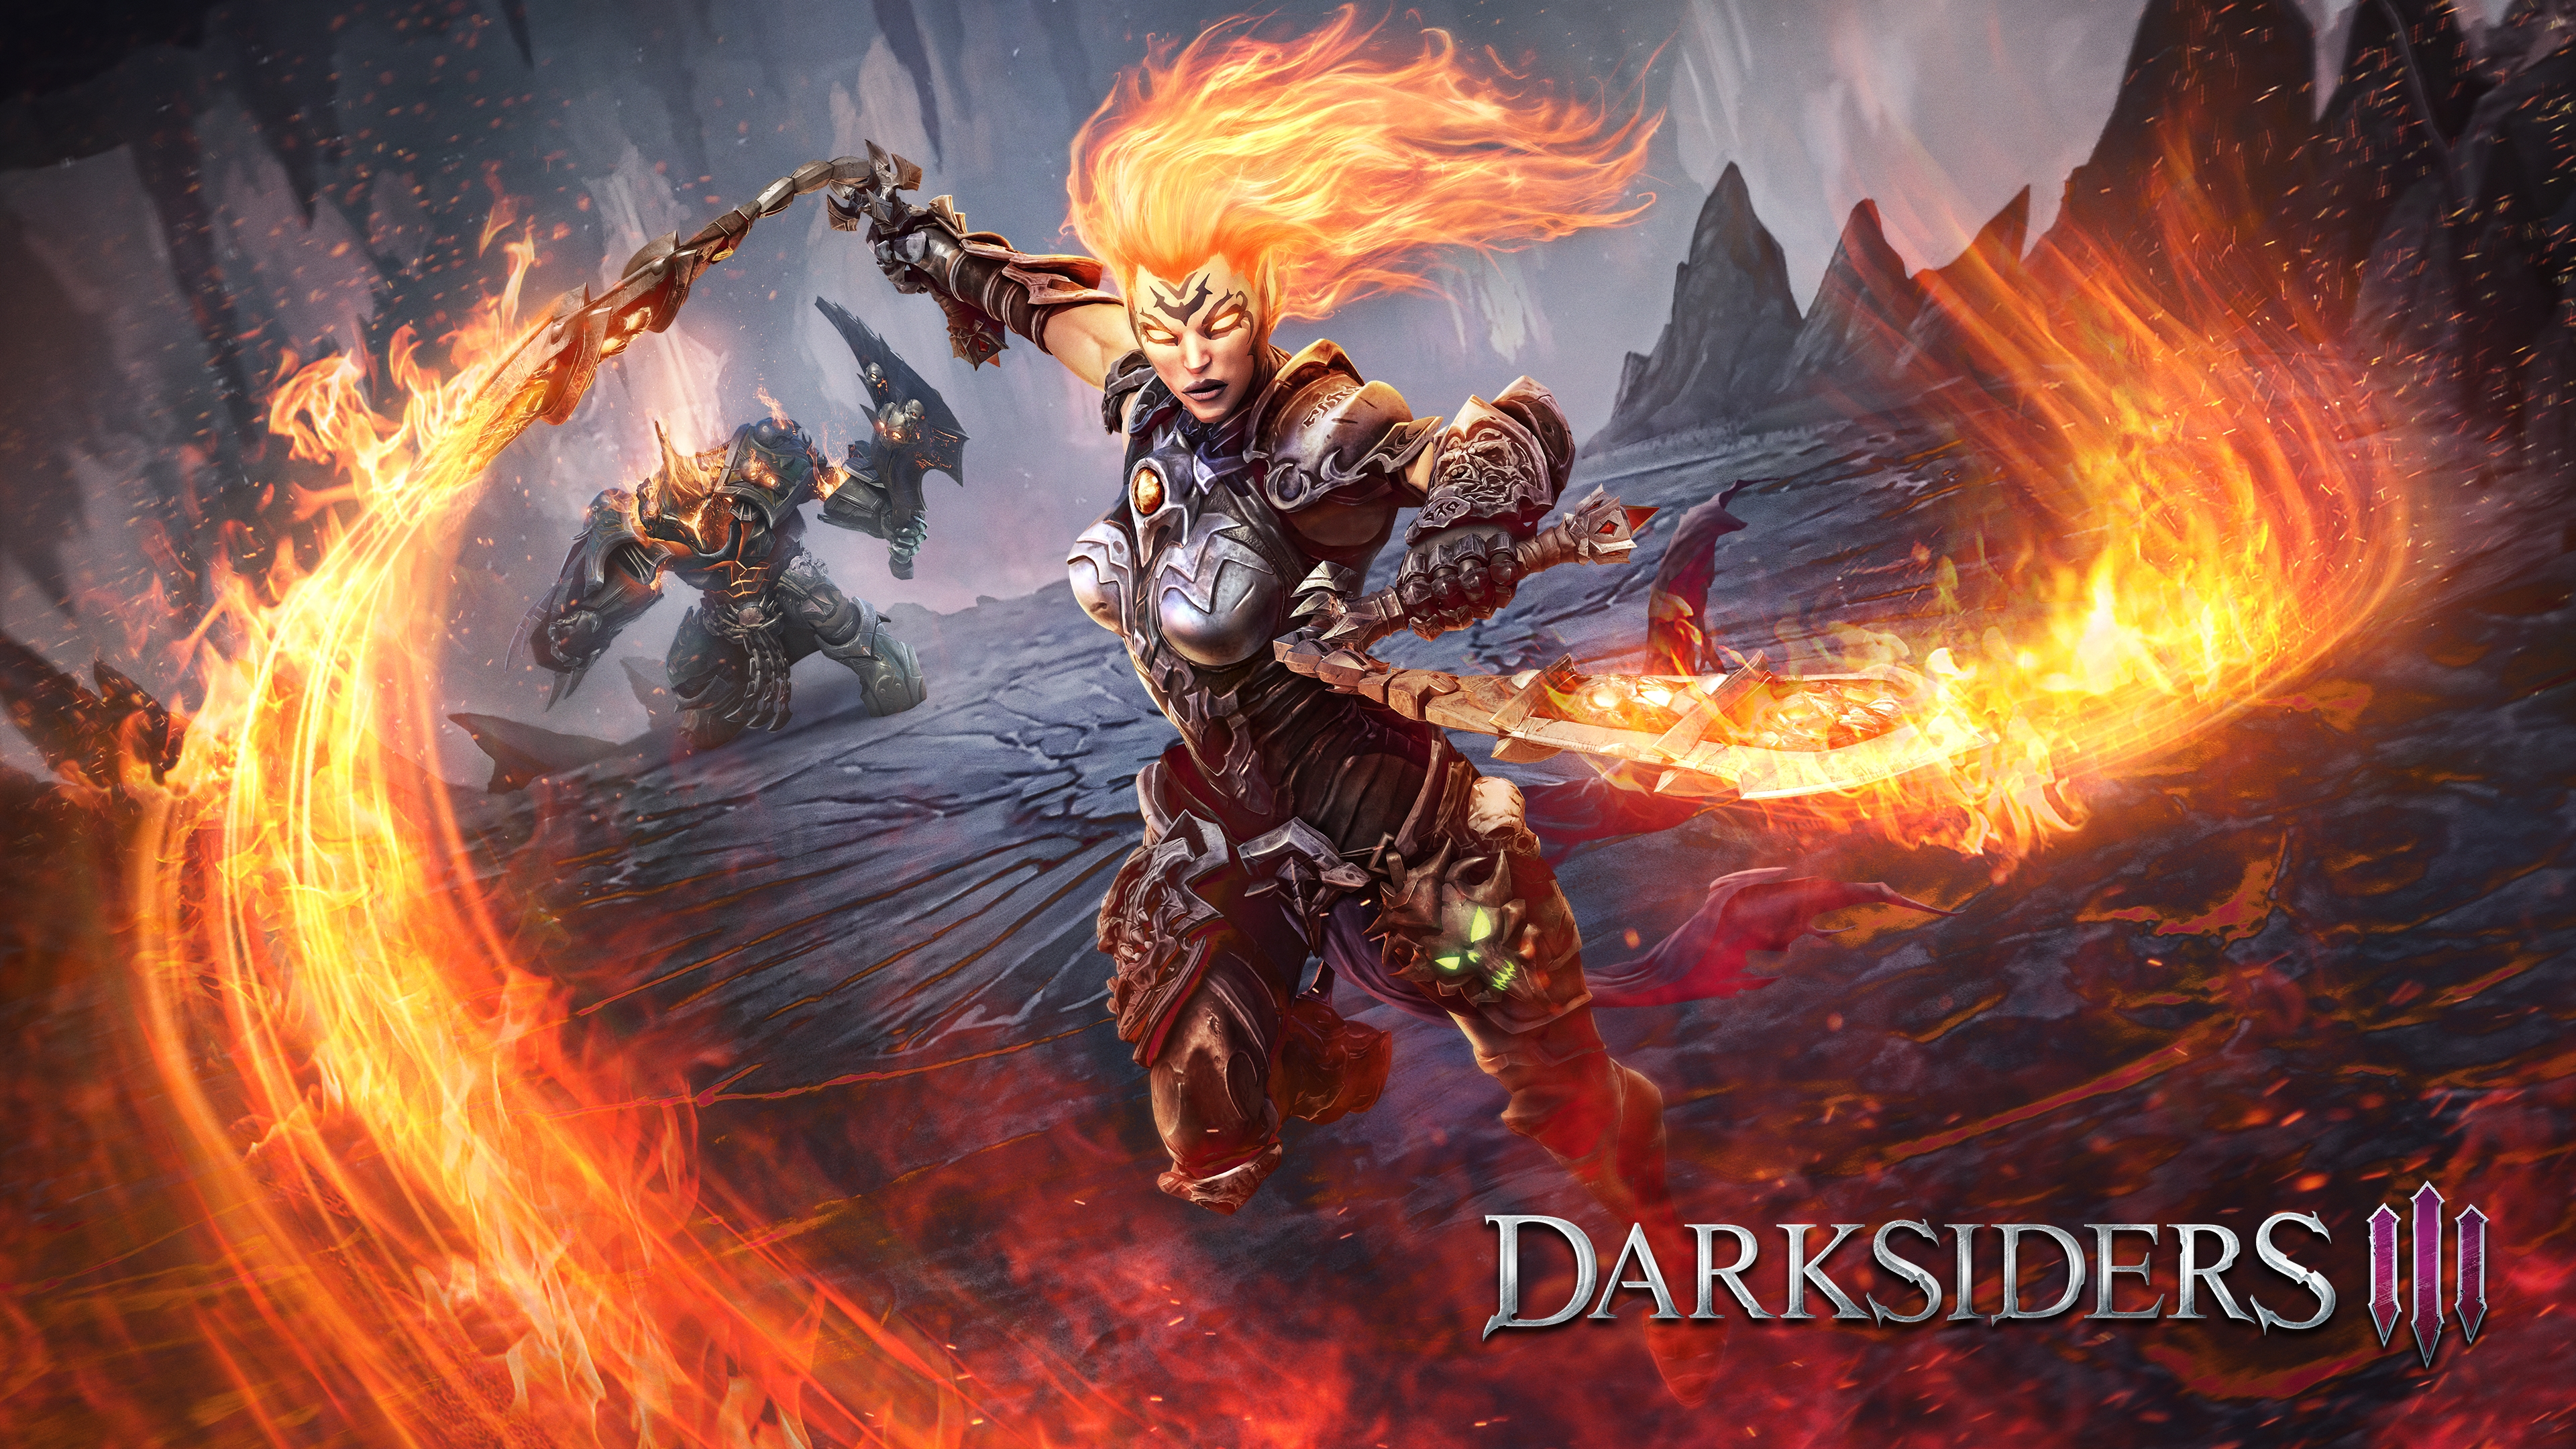 Darksiders III Screen Key Visual